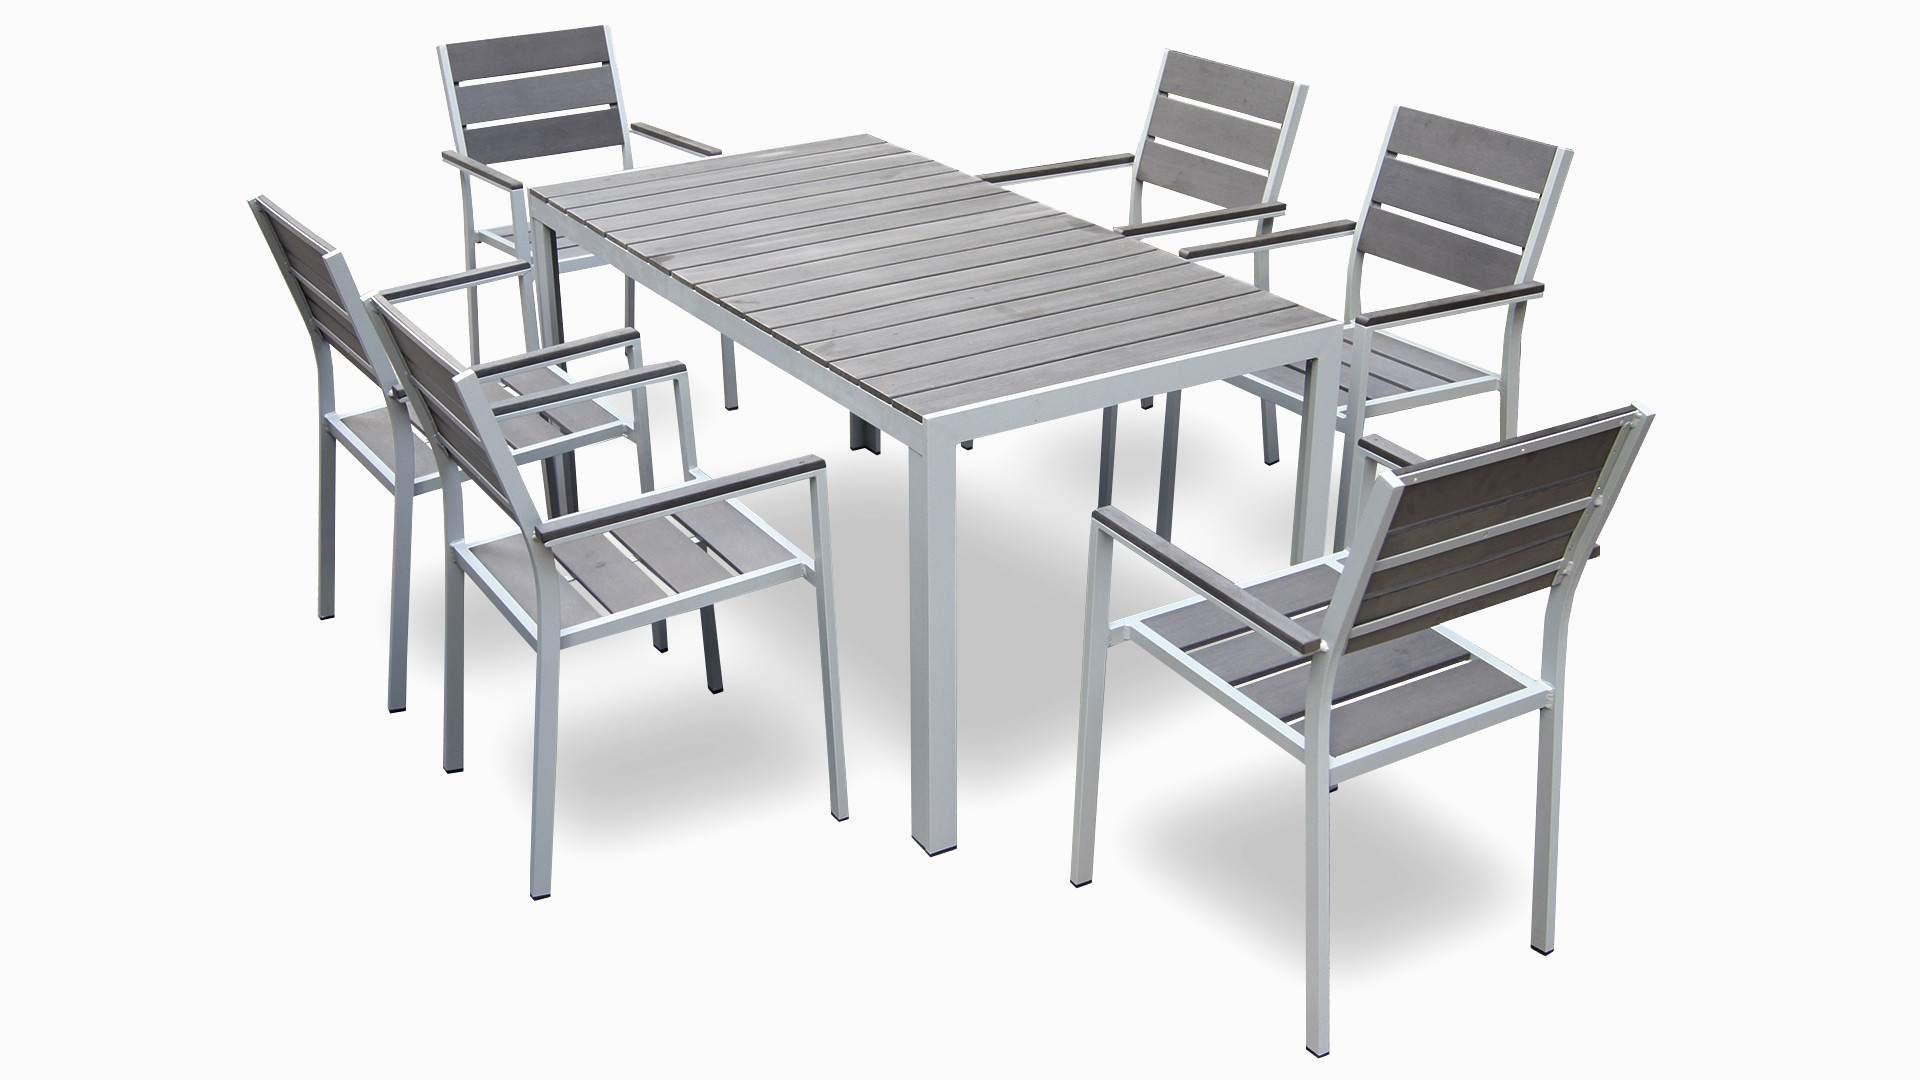 fauteuil salon de jardin lgant chaise leroy merlin pour fauteuil salon de jardin meilleur chaise leroy merlin relax of